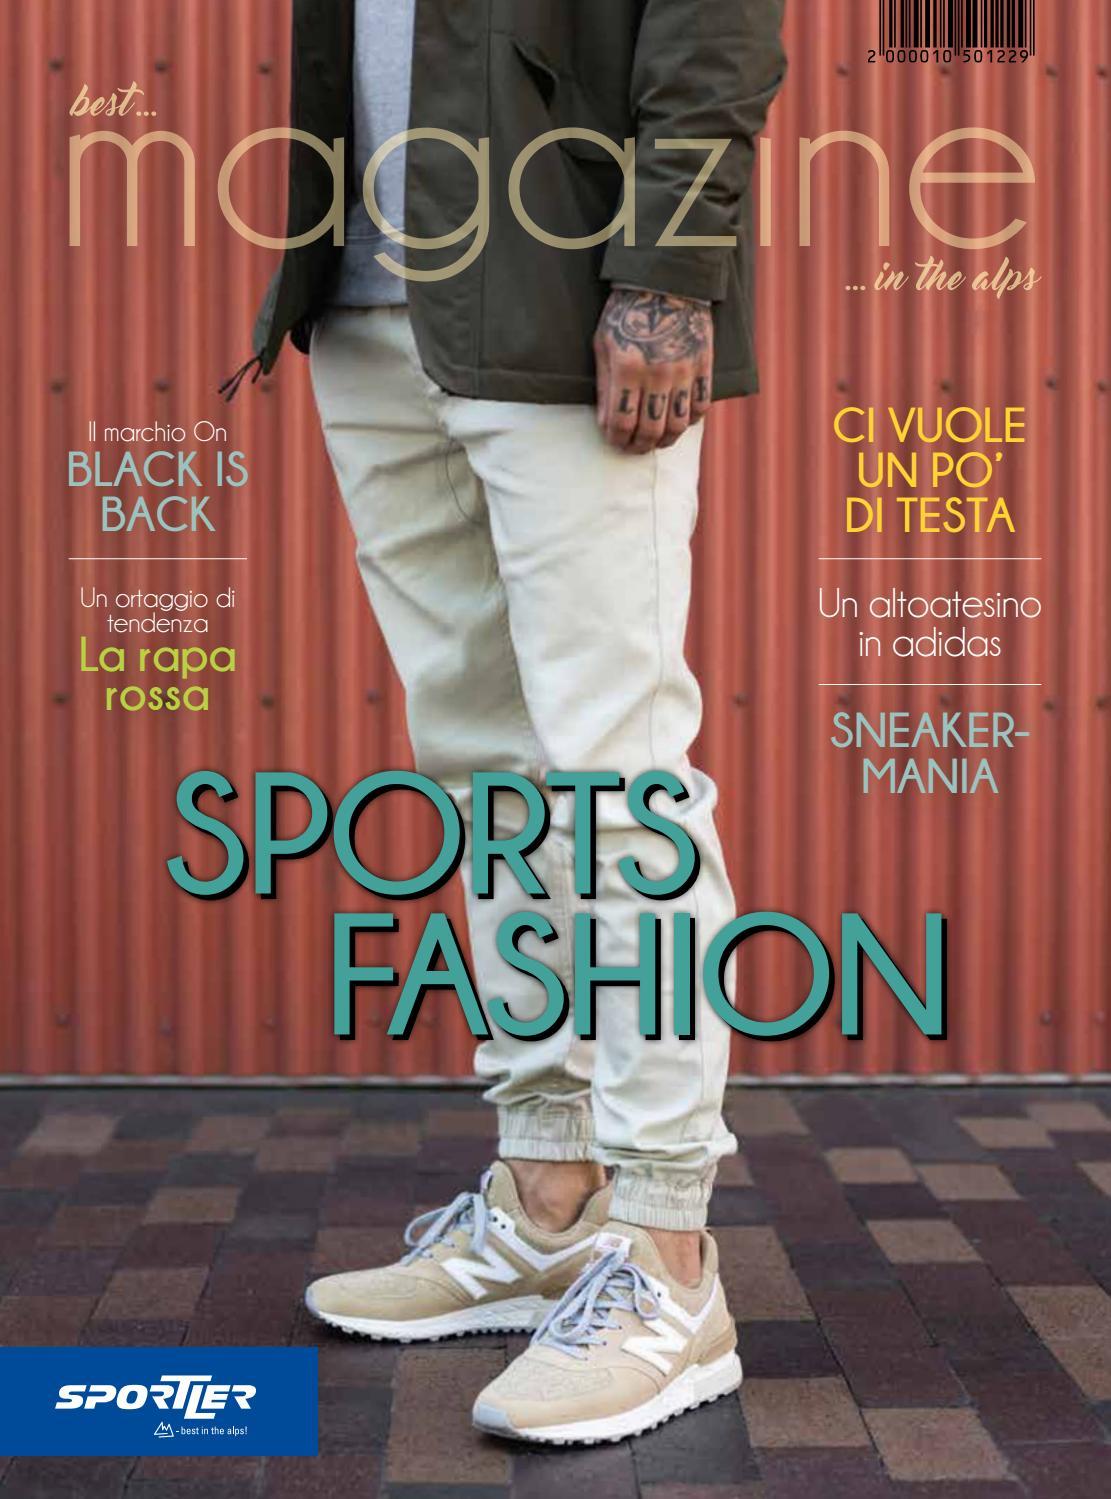 Magazine SPORTS FASHION Ita by SPORTLER issuu